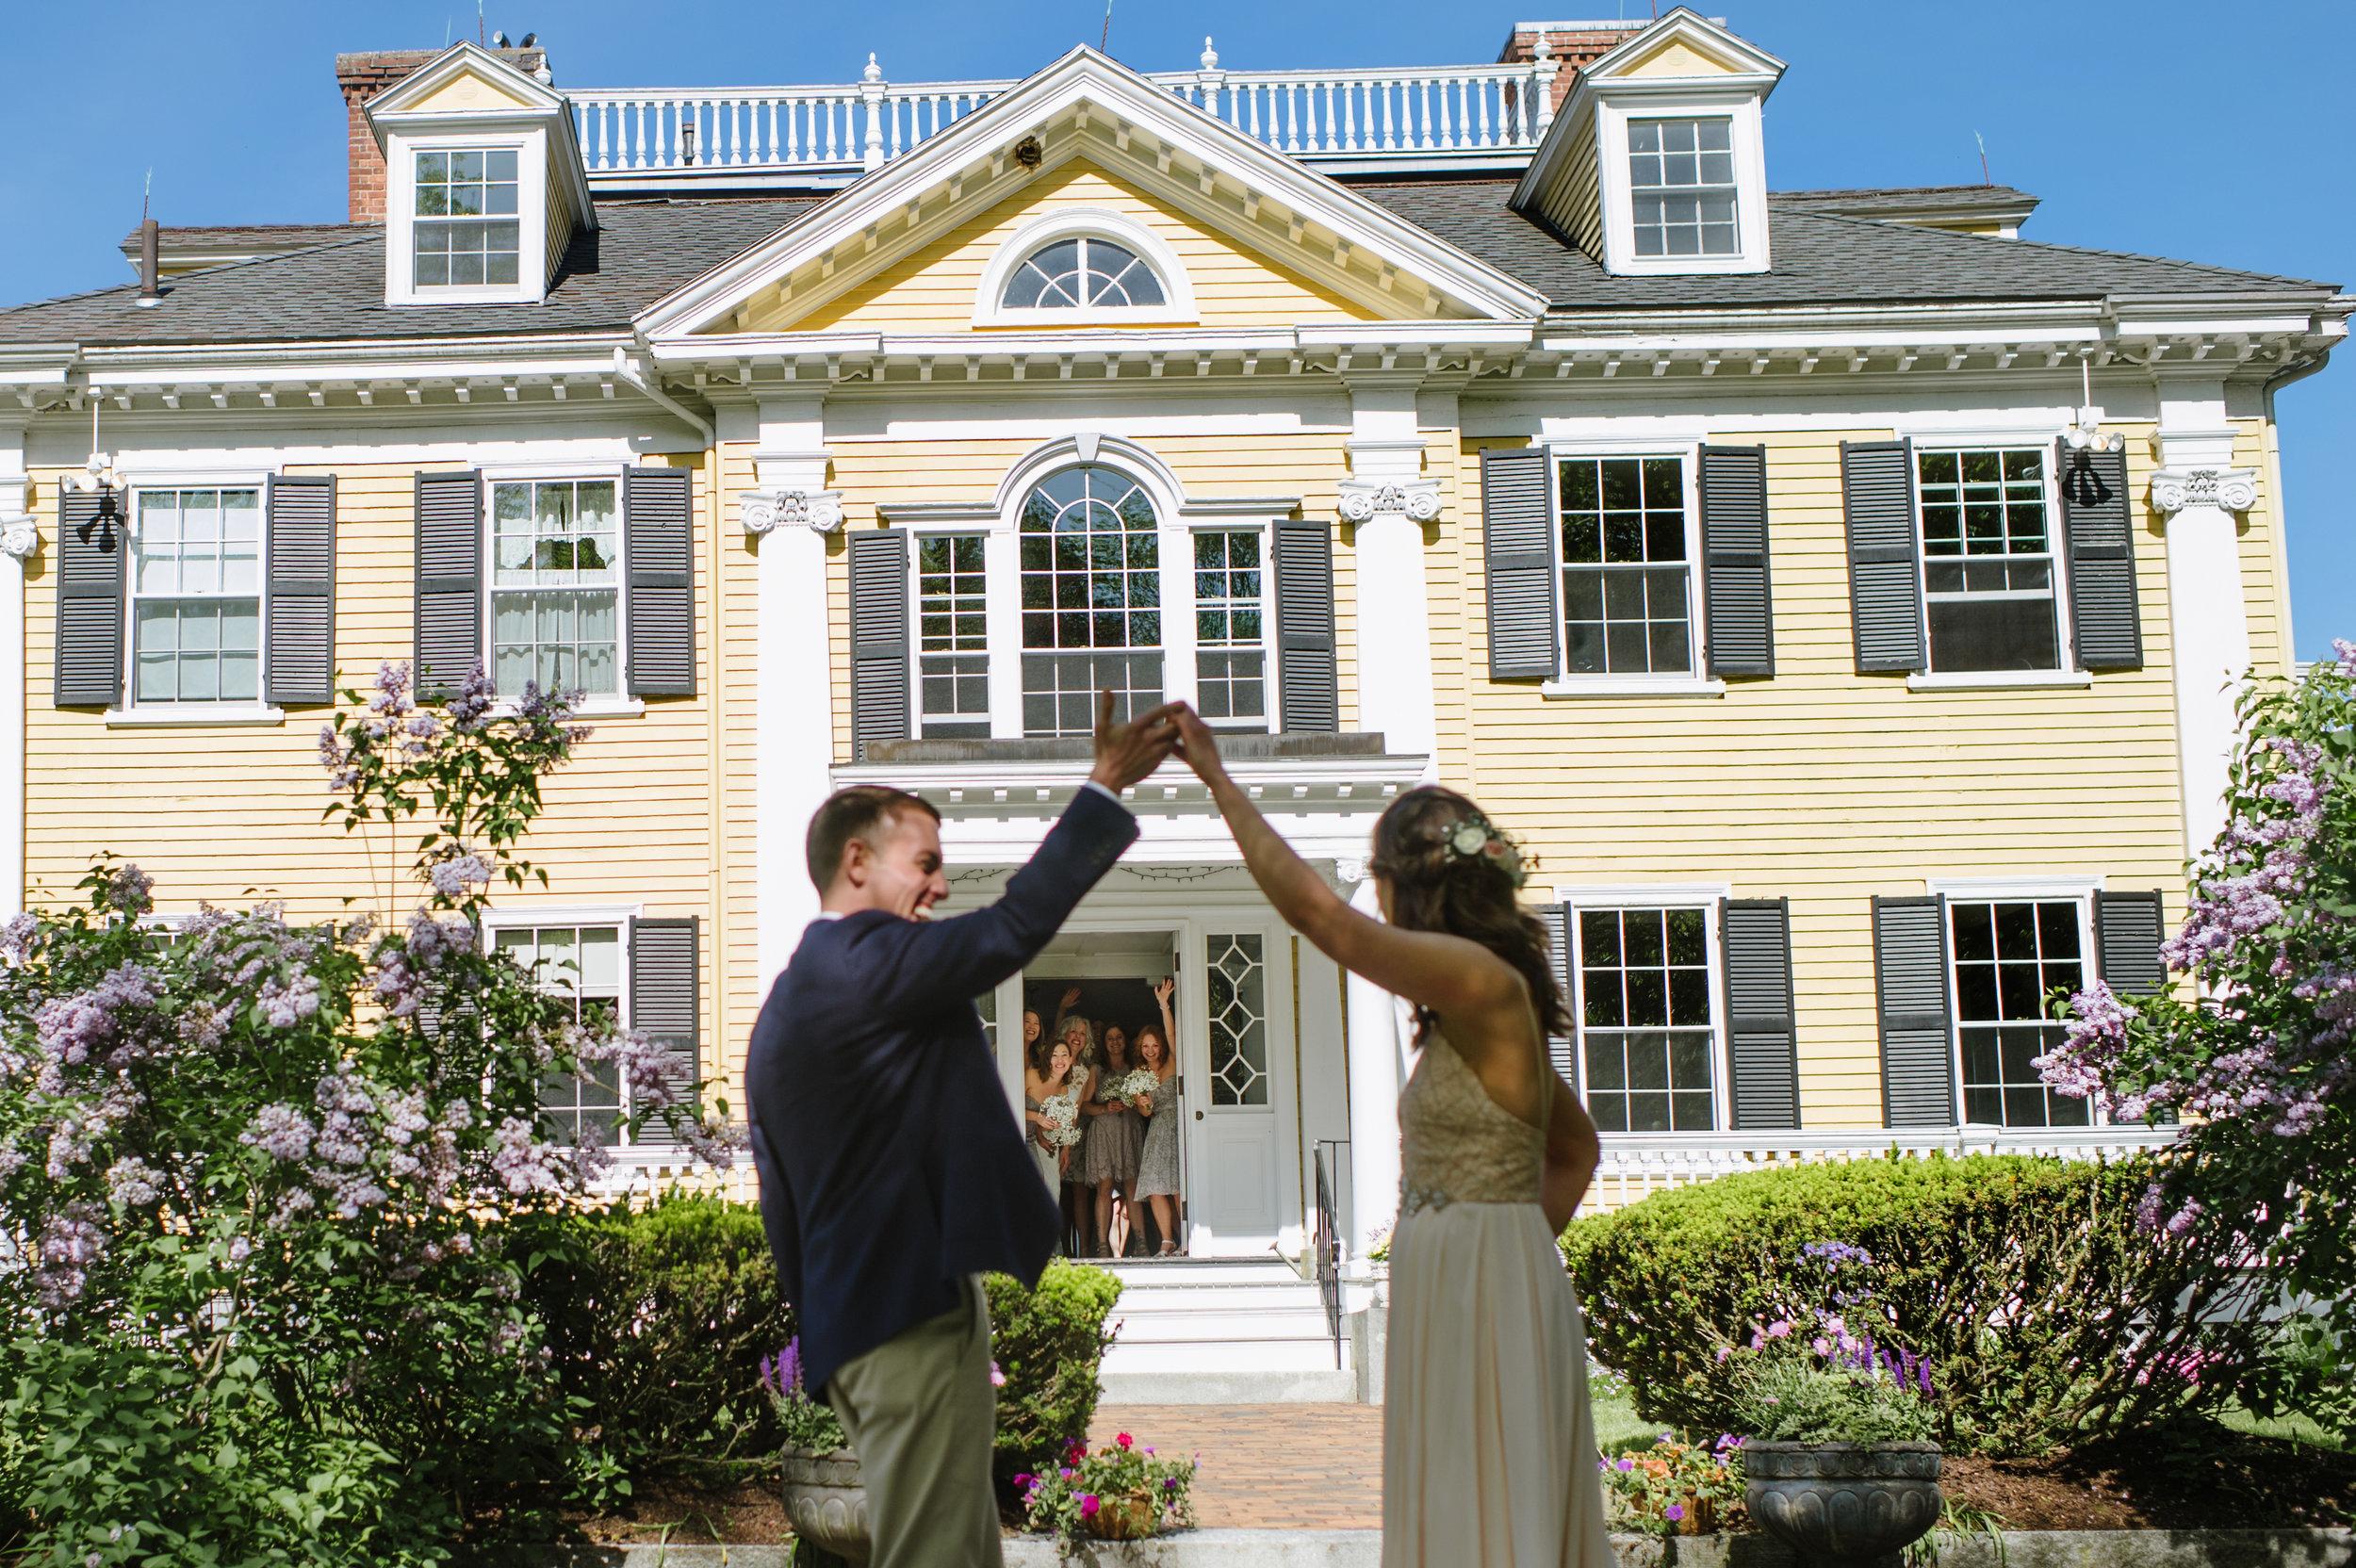 Candid-Wedding-Photography-Boston015.jpg